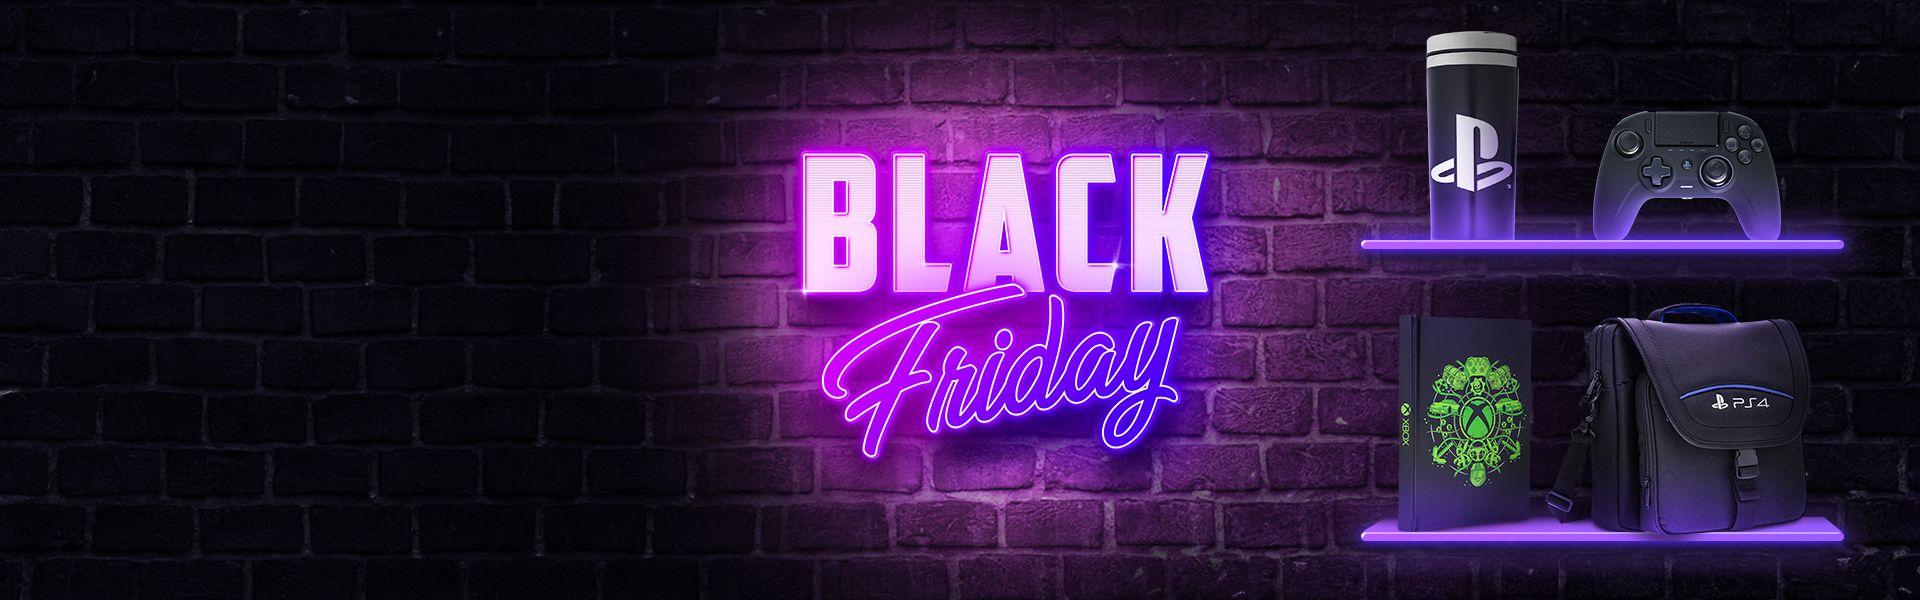 Black Friday deals on console rewards!